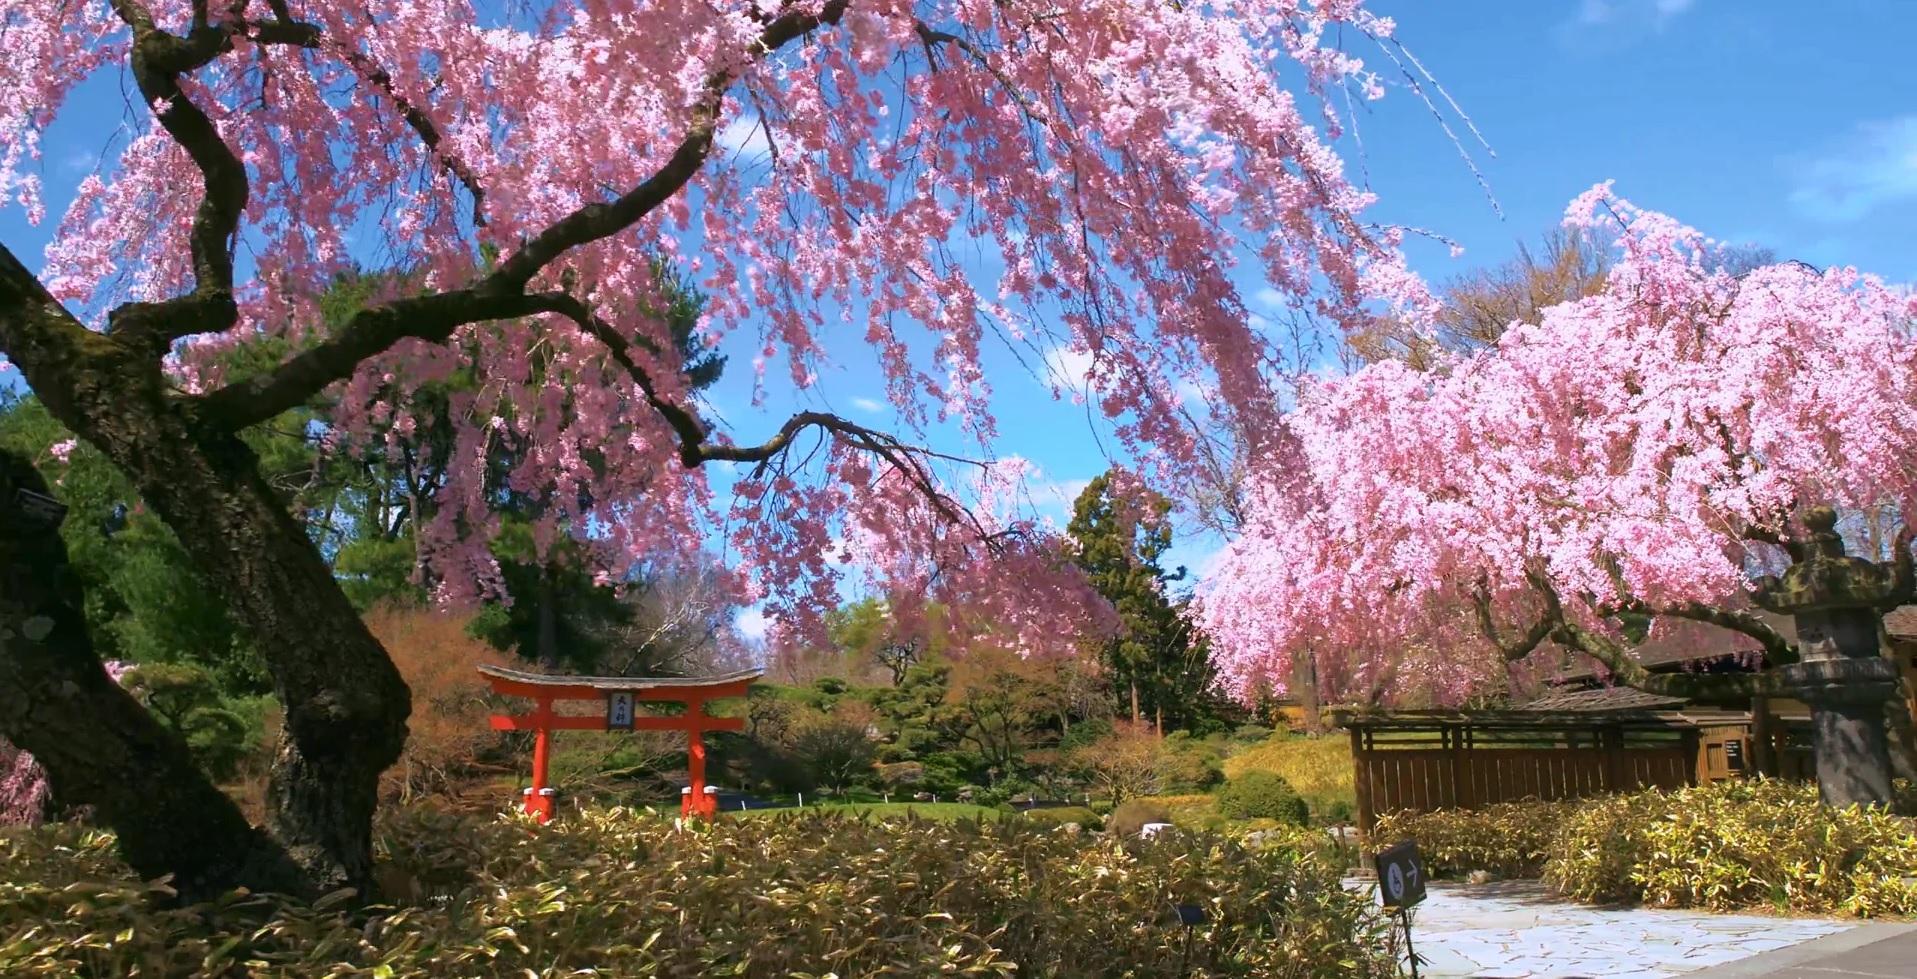 VIDEO: Brooklyn Botanic Garden, Stroll through the Japanese Garden in Bloom